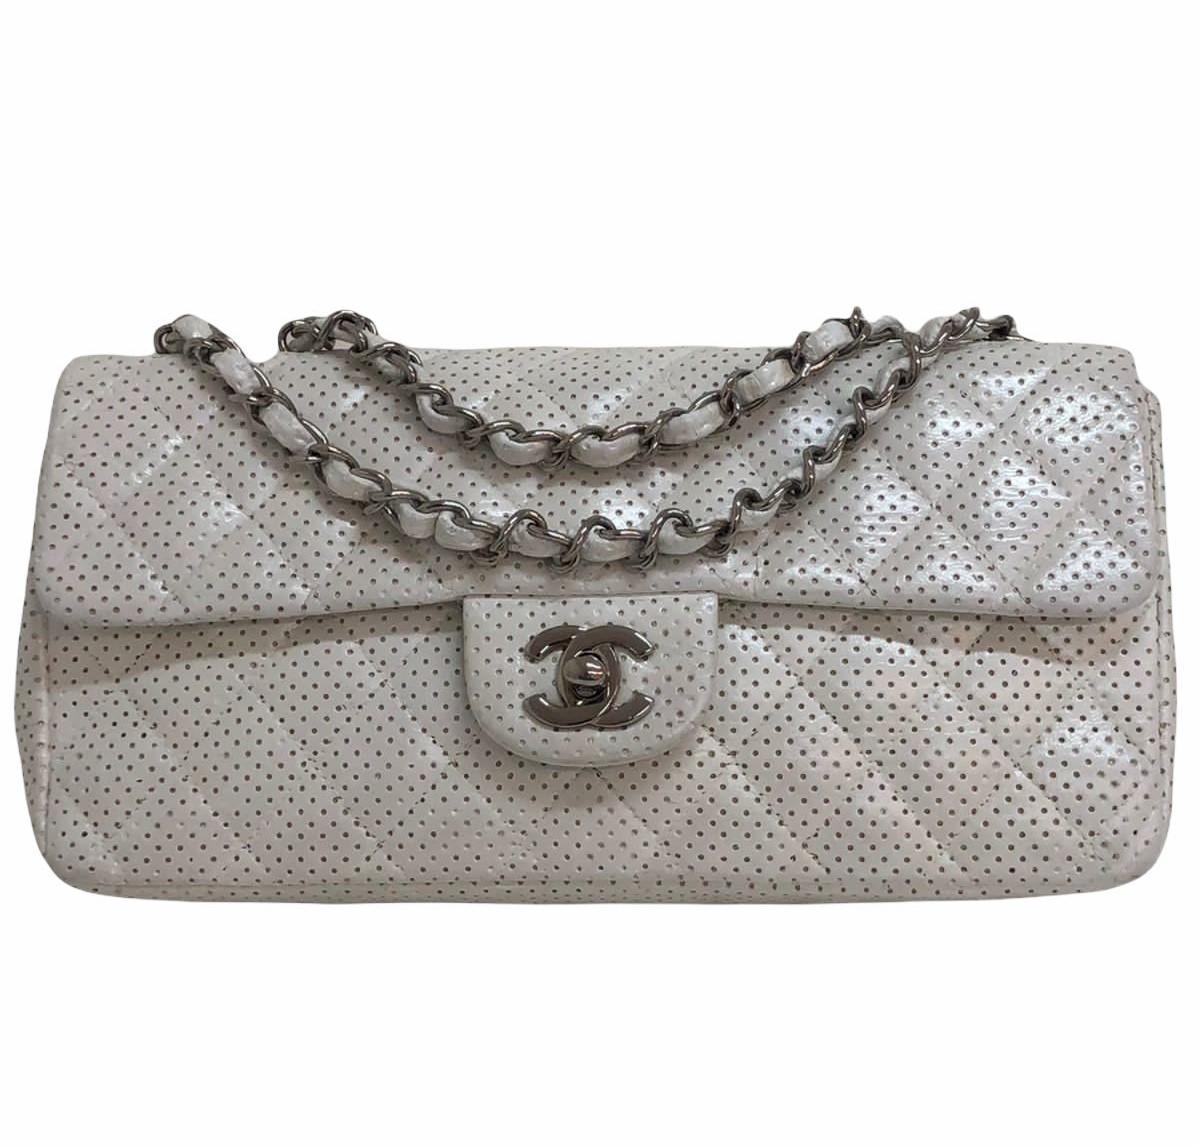 Bolsa Chanel Baseball Spirit Perforated Off-White